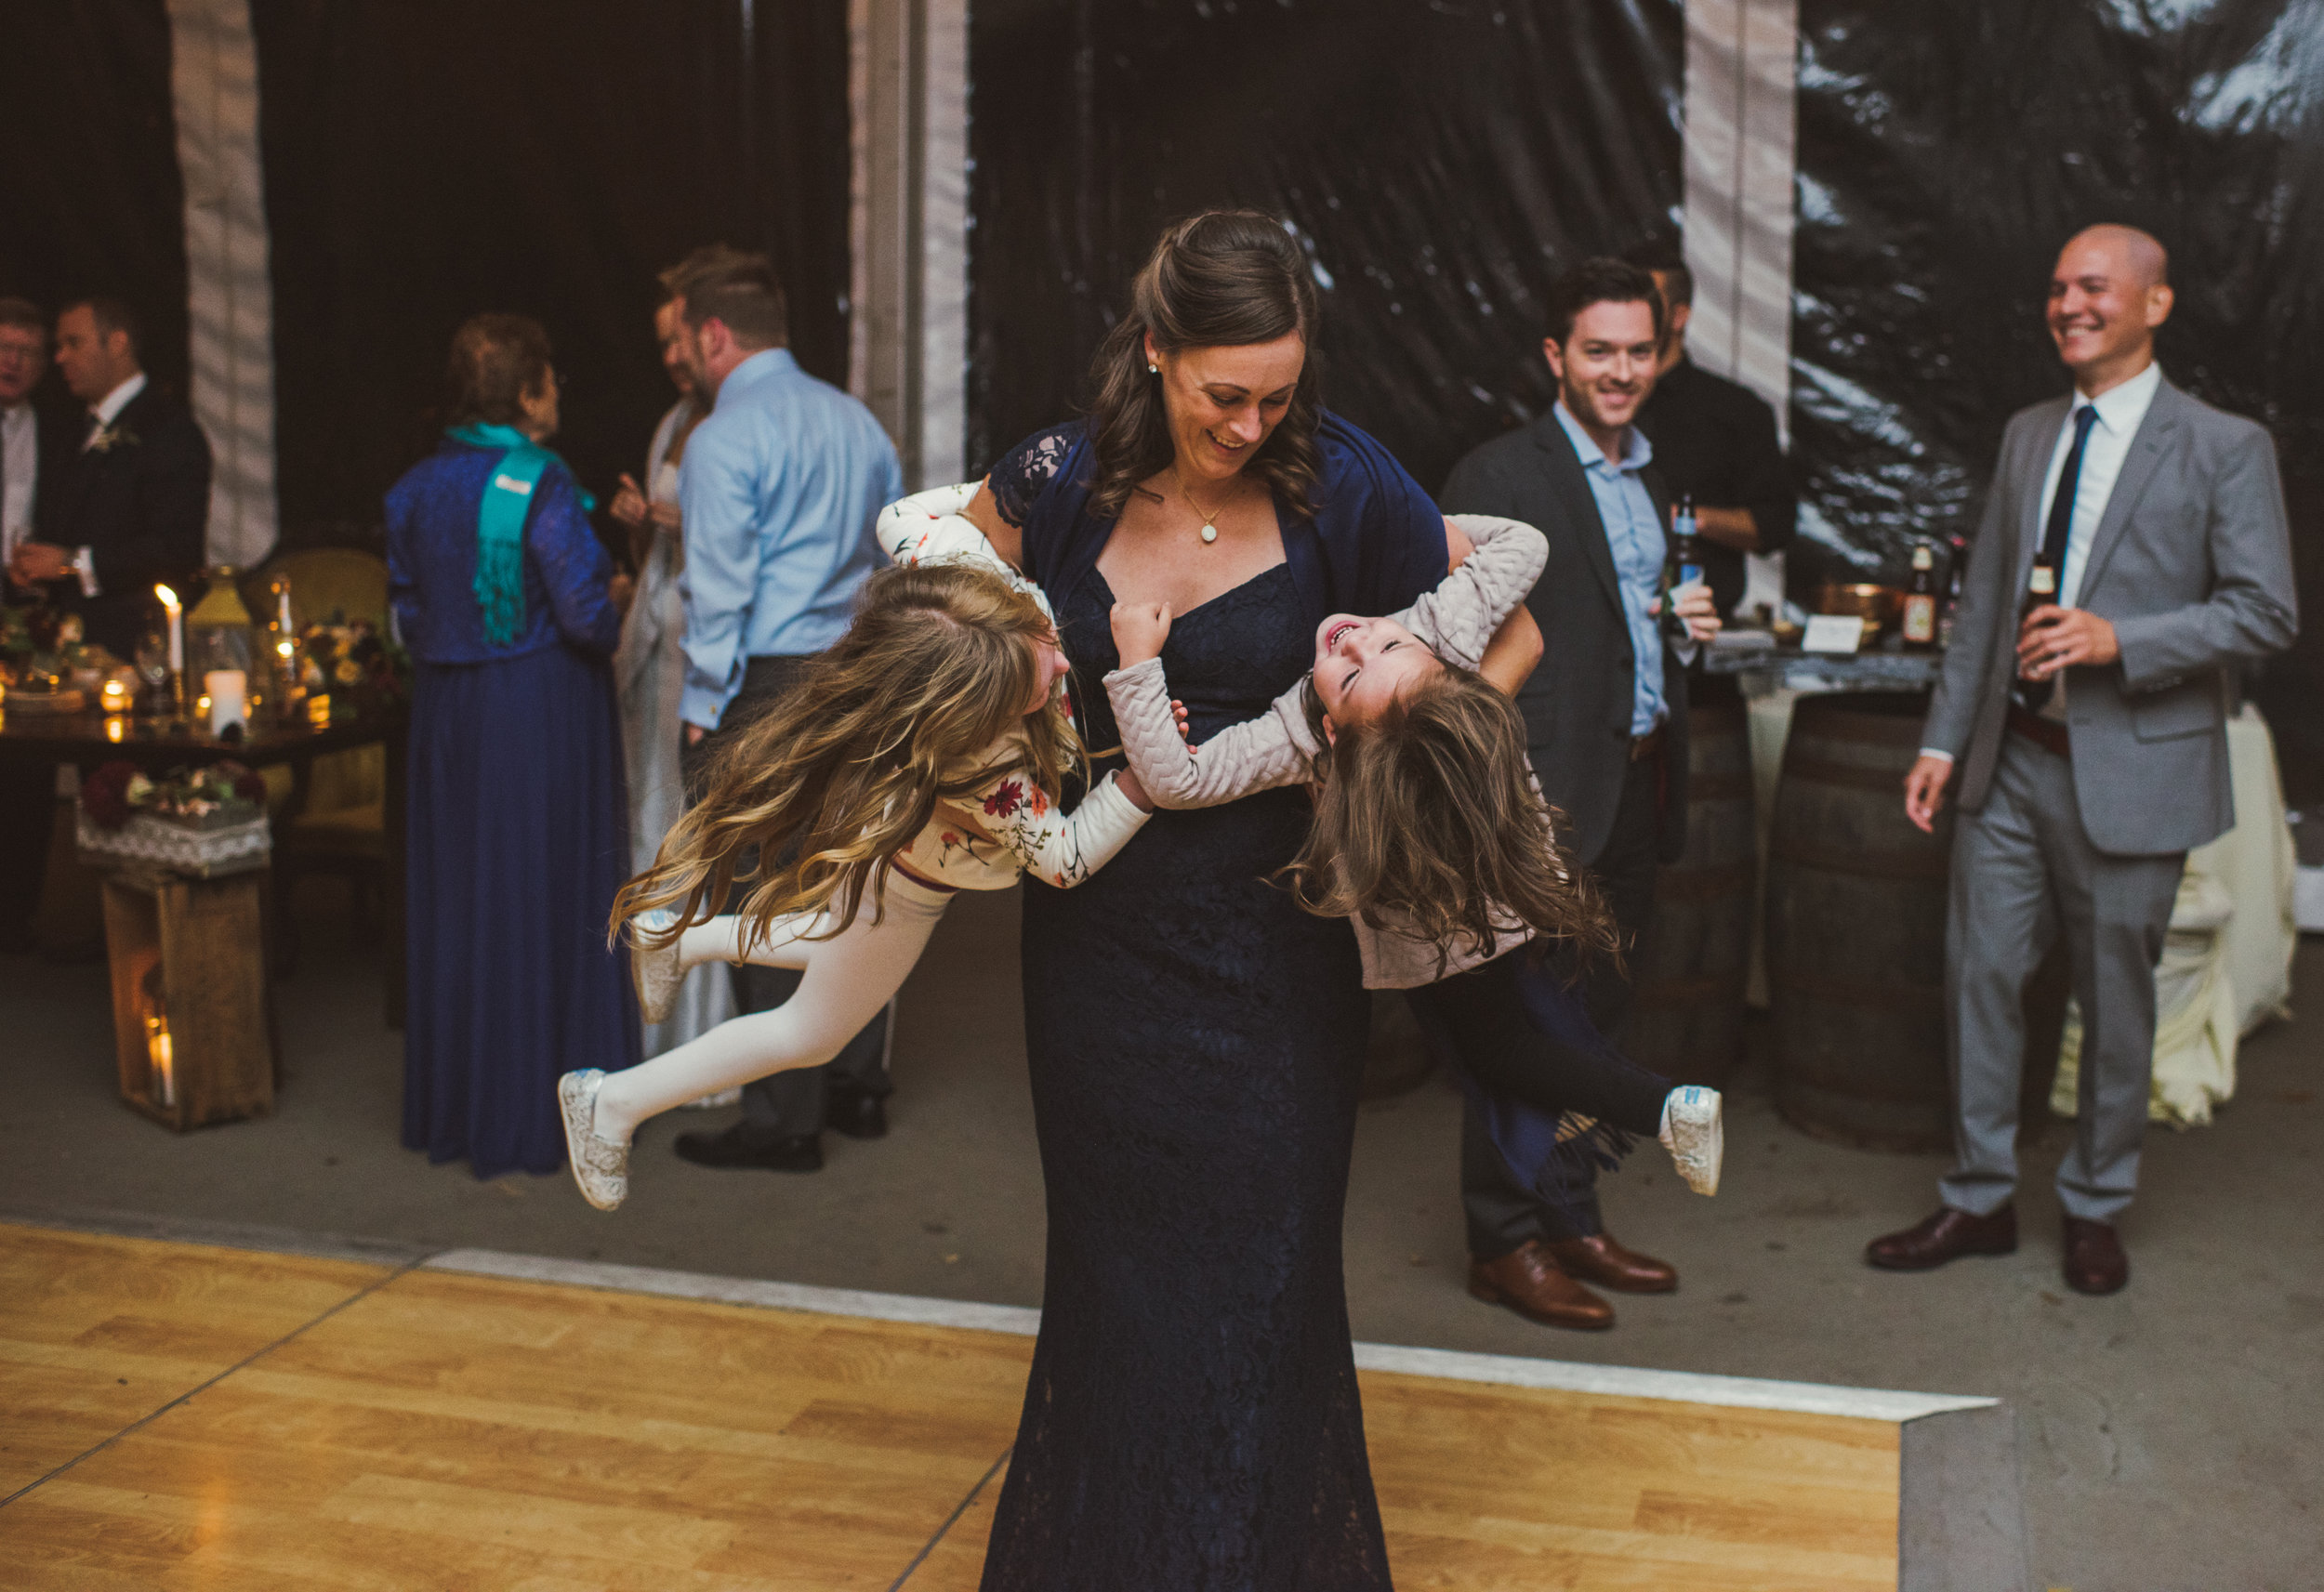 JACQUELINE & ANDREW WARSHAWER -BROOKMILL FARM FALL WEDDING - INTIMATE WEDDING PHOTOGRAPHER - TWOTWENTY by CHI-CHI AGBIM-587.jpg